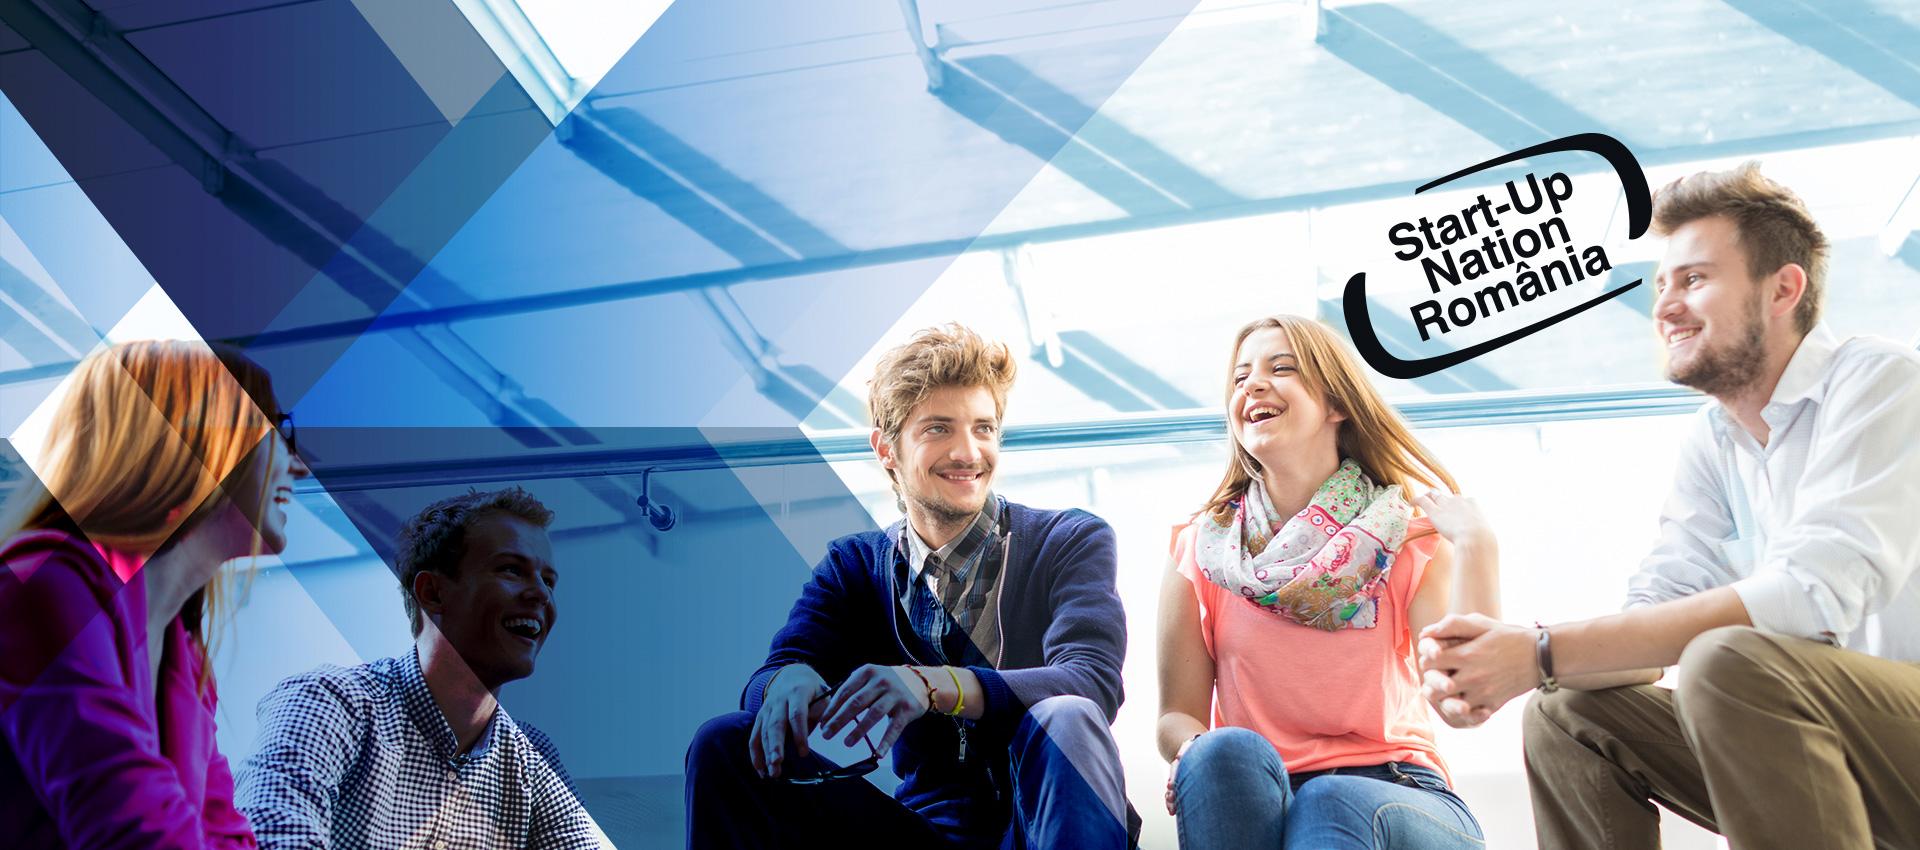 Centrul de Dezvoltare Smart Antreprenor